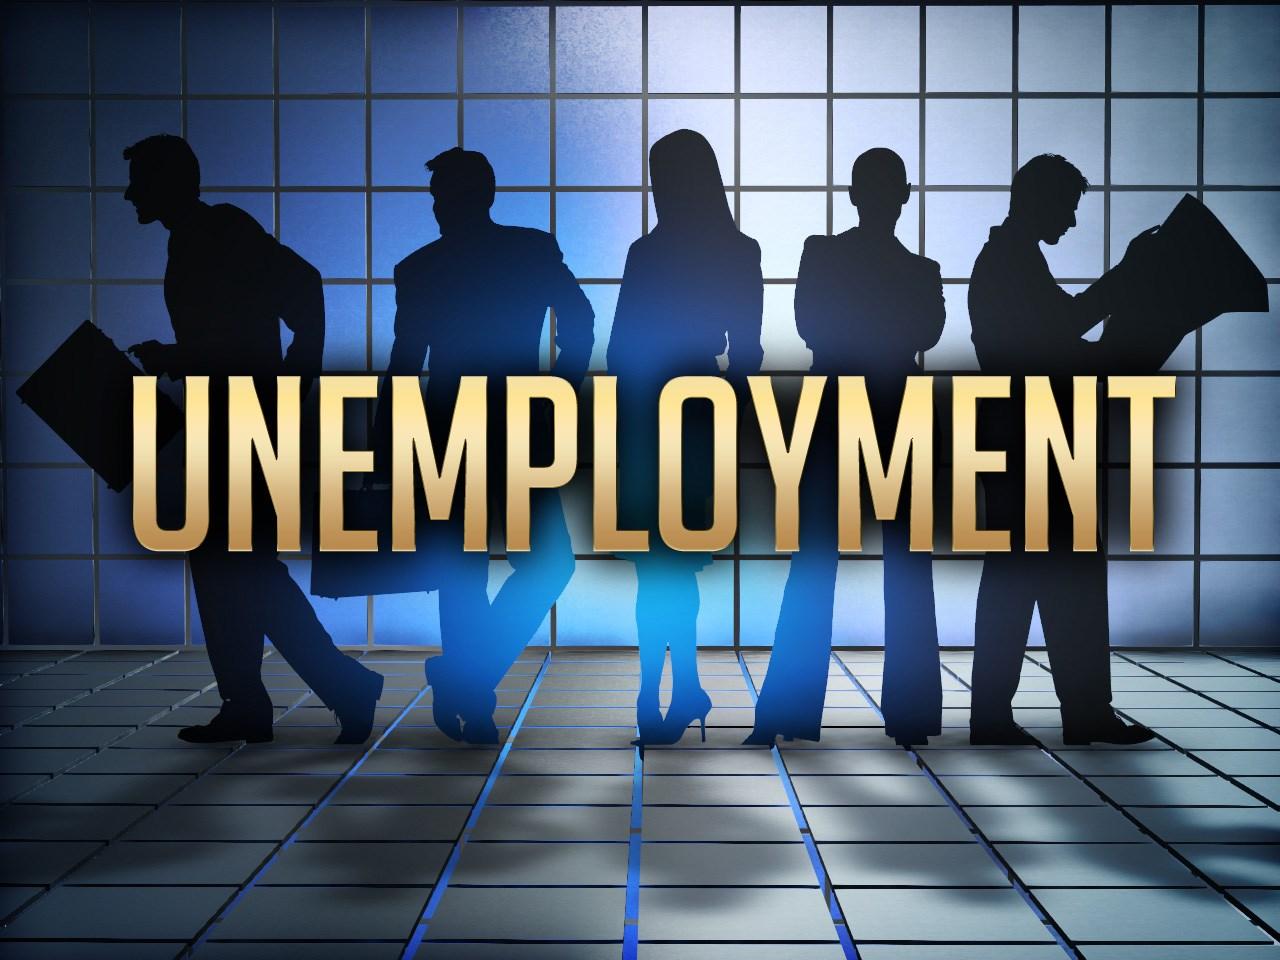 Unemployment generic